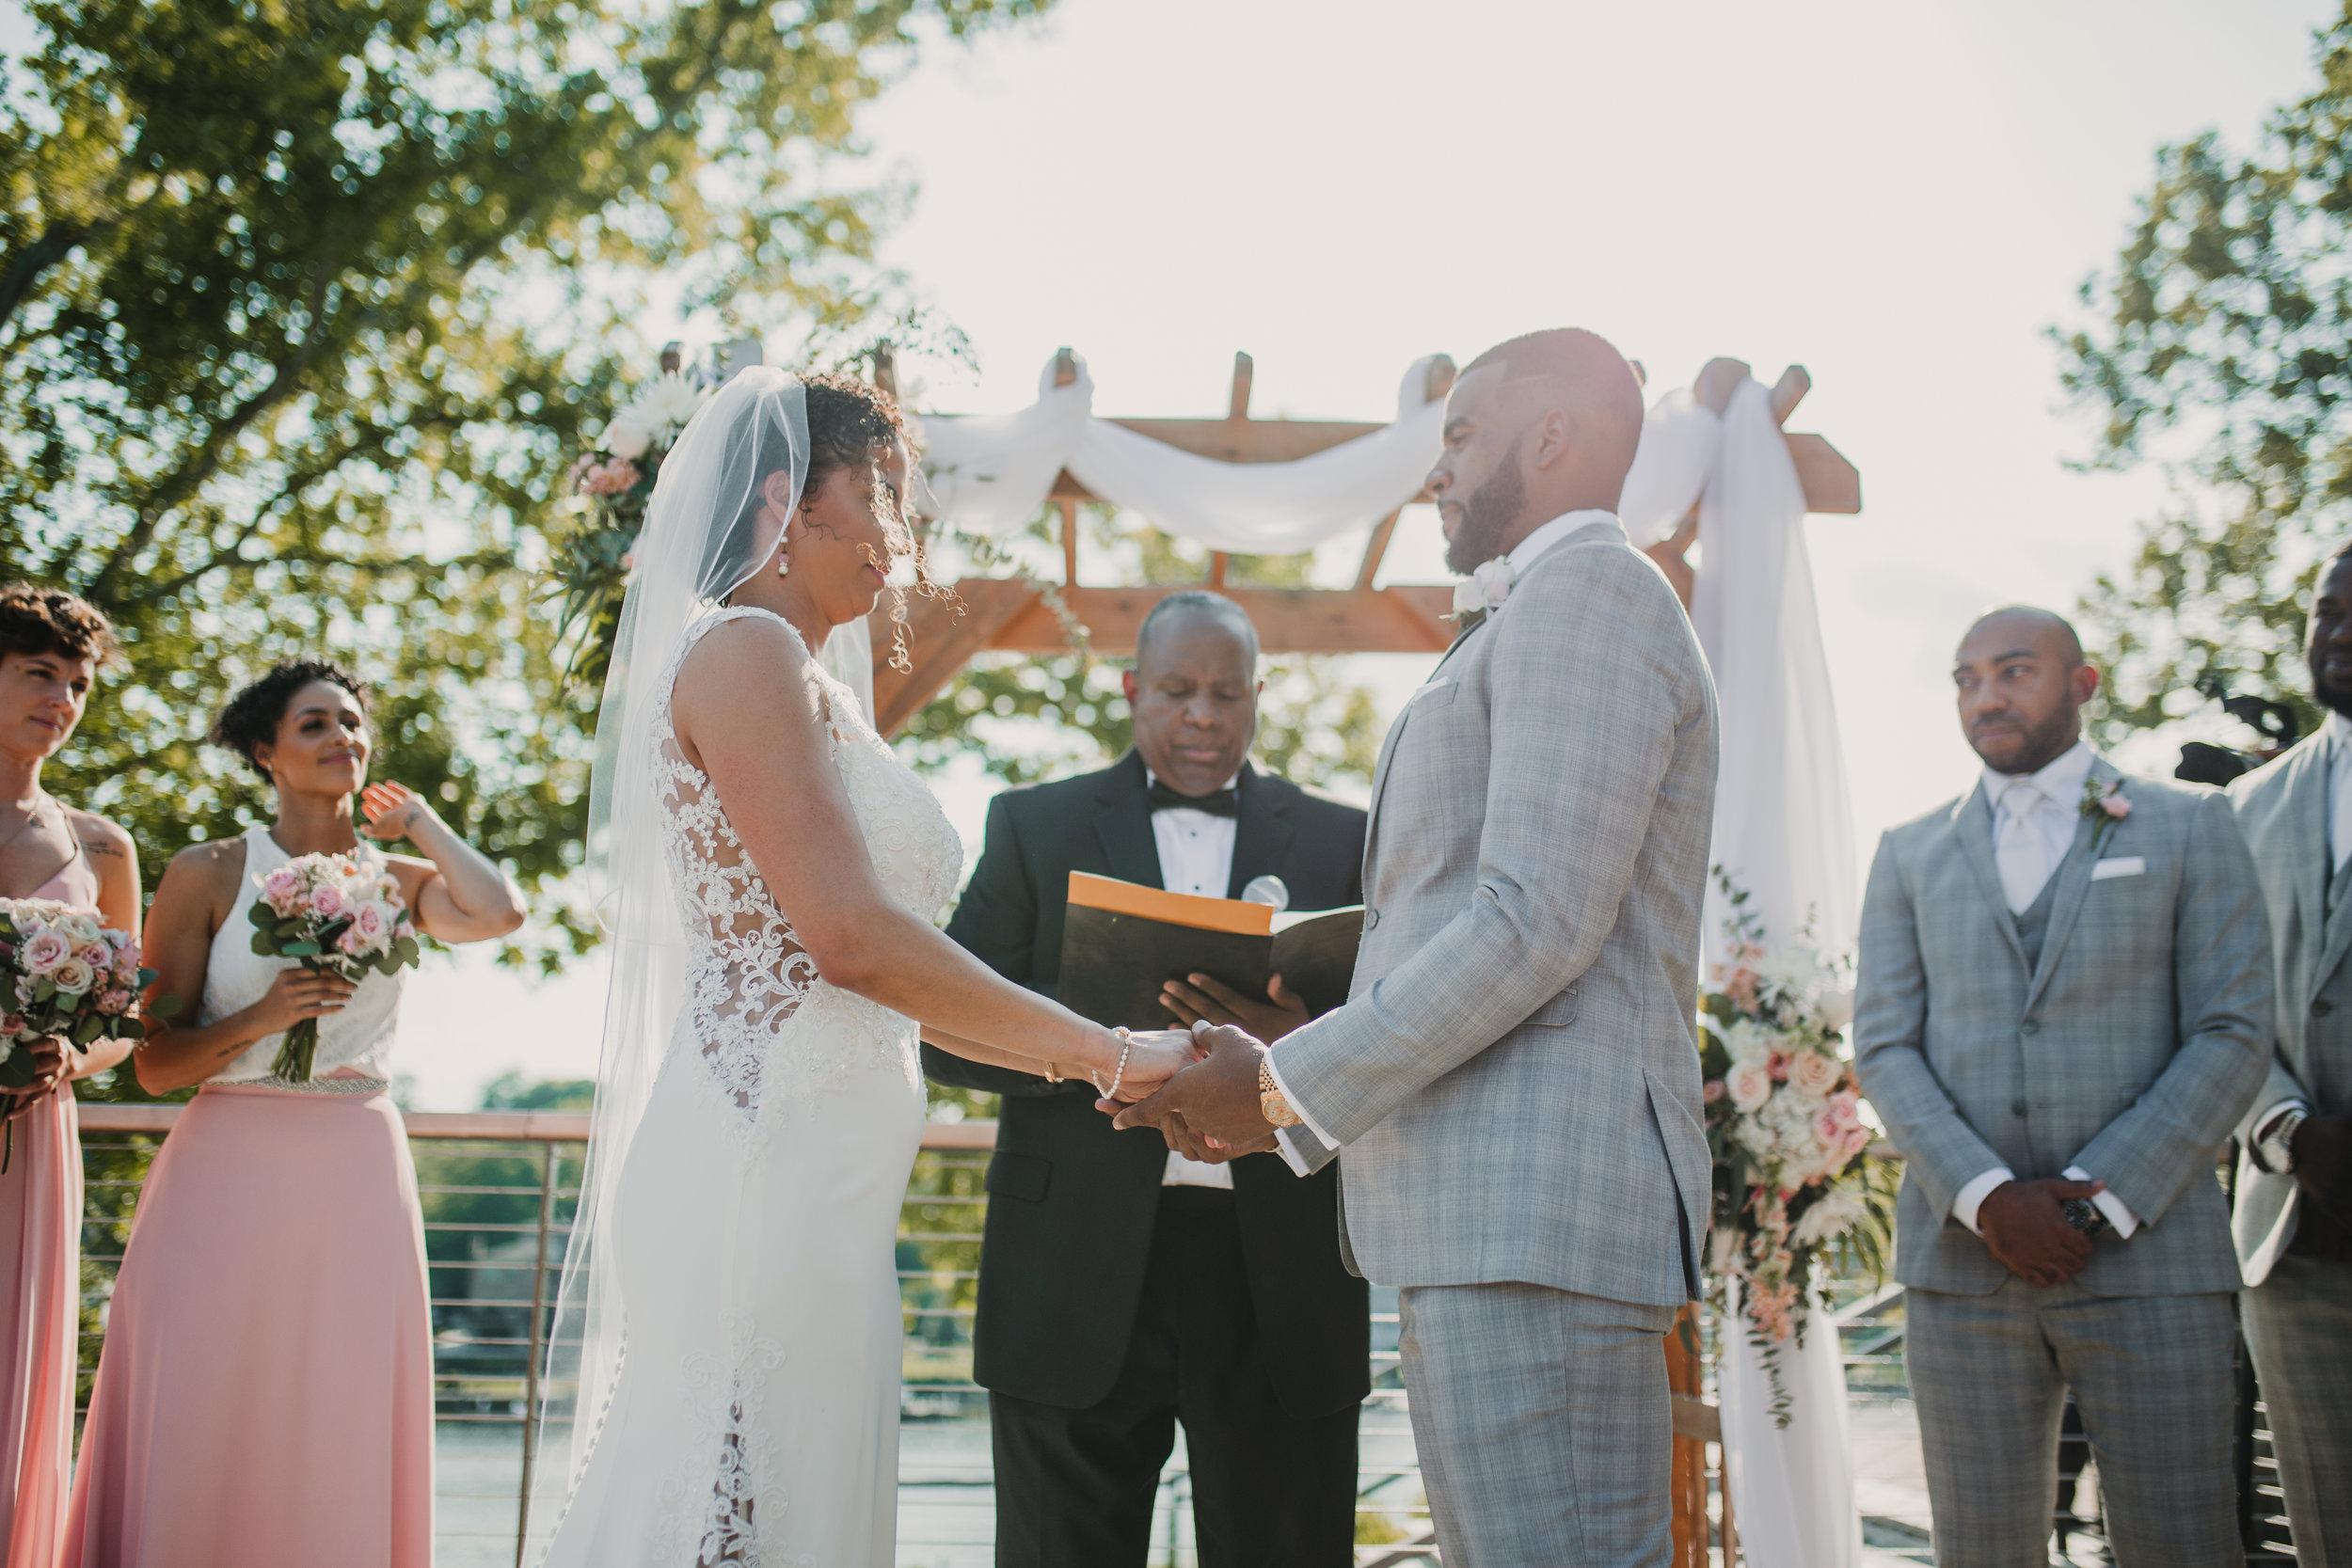 kendra_cameron_wedding(196of783).jpg